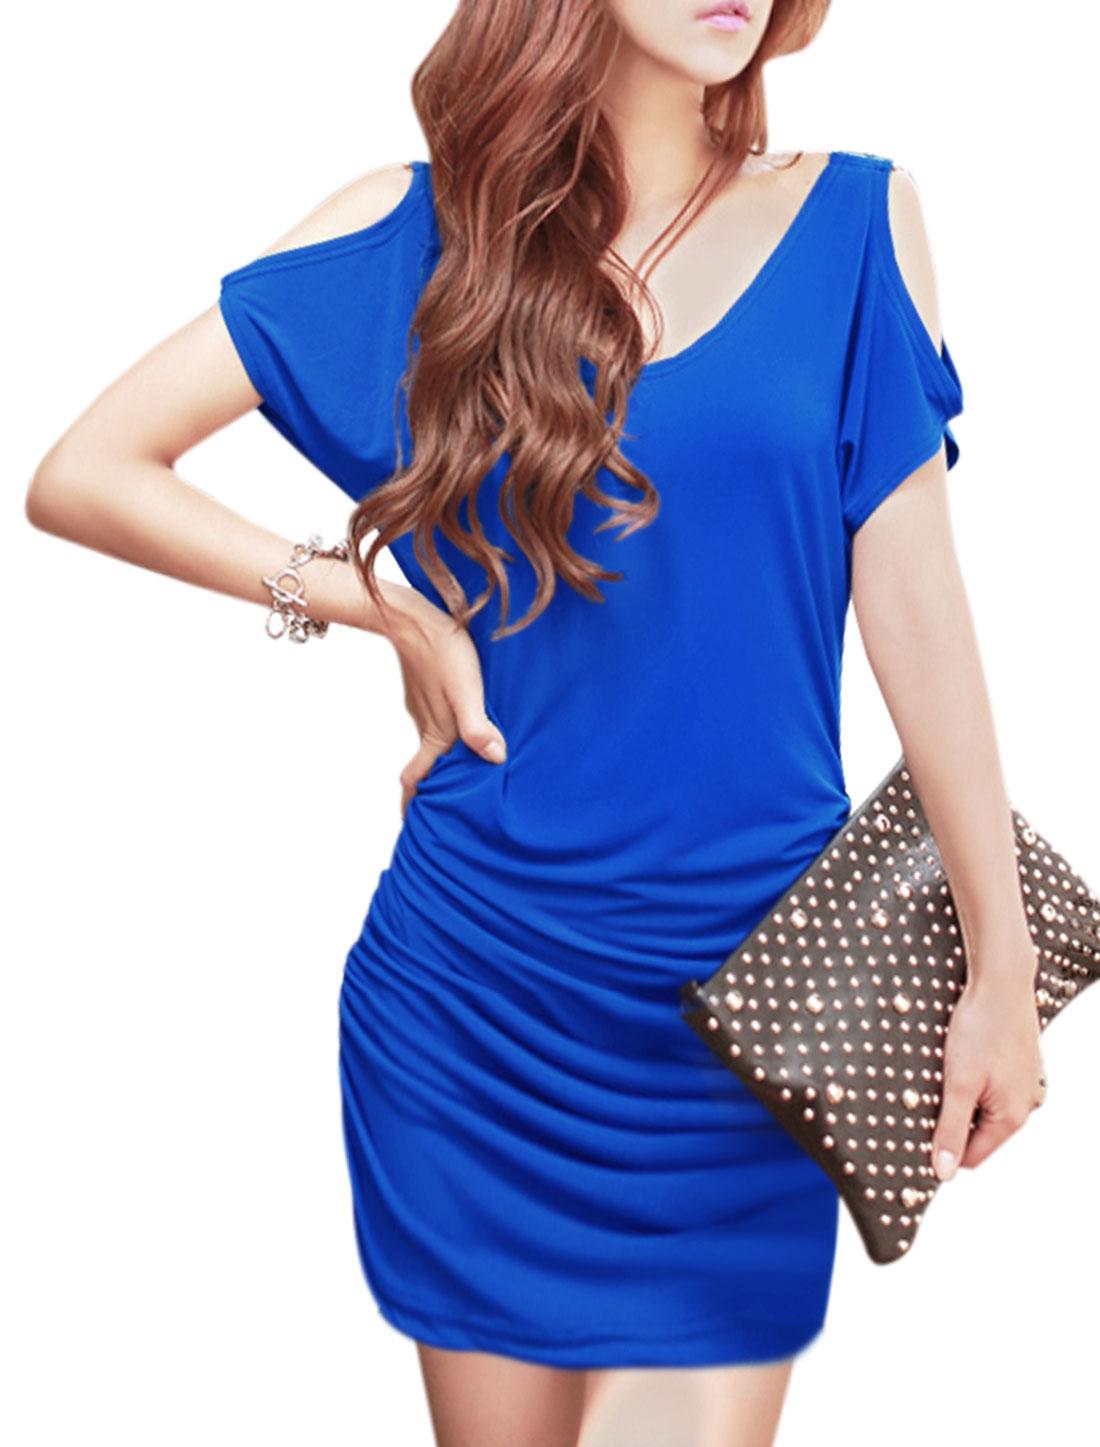 Woman Buckled Decor Cut Out Shoulder Shirred Sides Blouson Dress Blue S